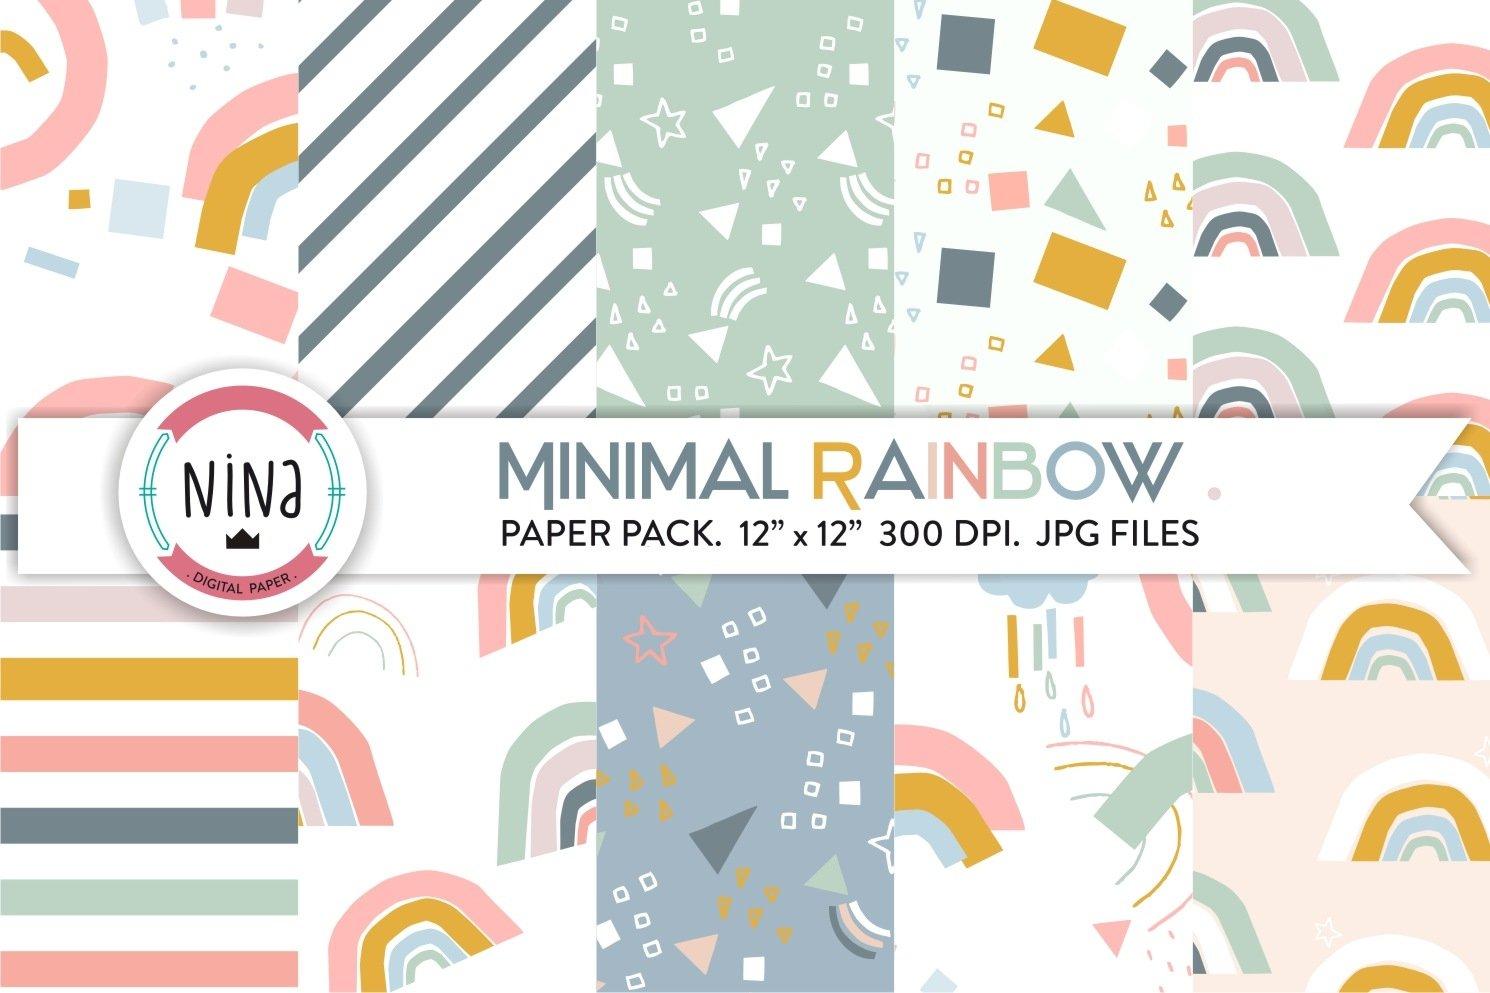 Minimal Rainbow Digital Paper Pastel Modern Patterns 465558 Patterns Design Bundles